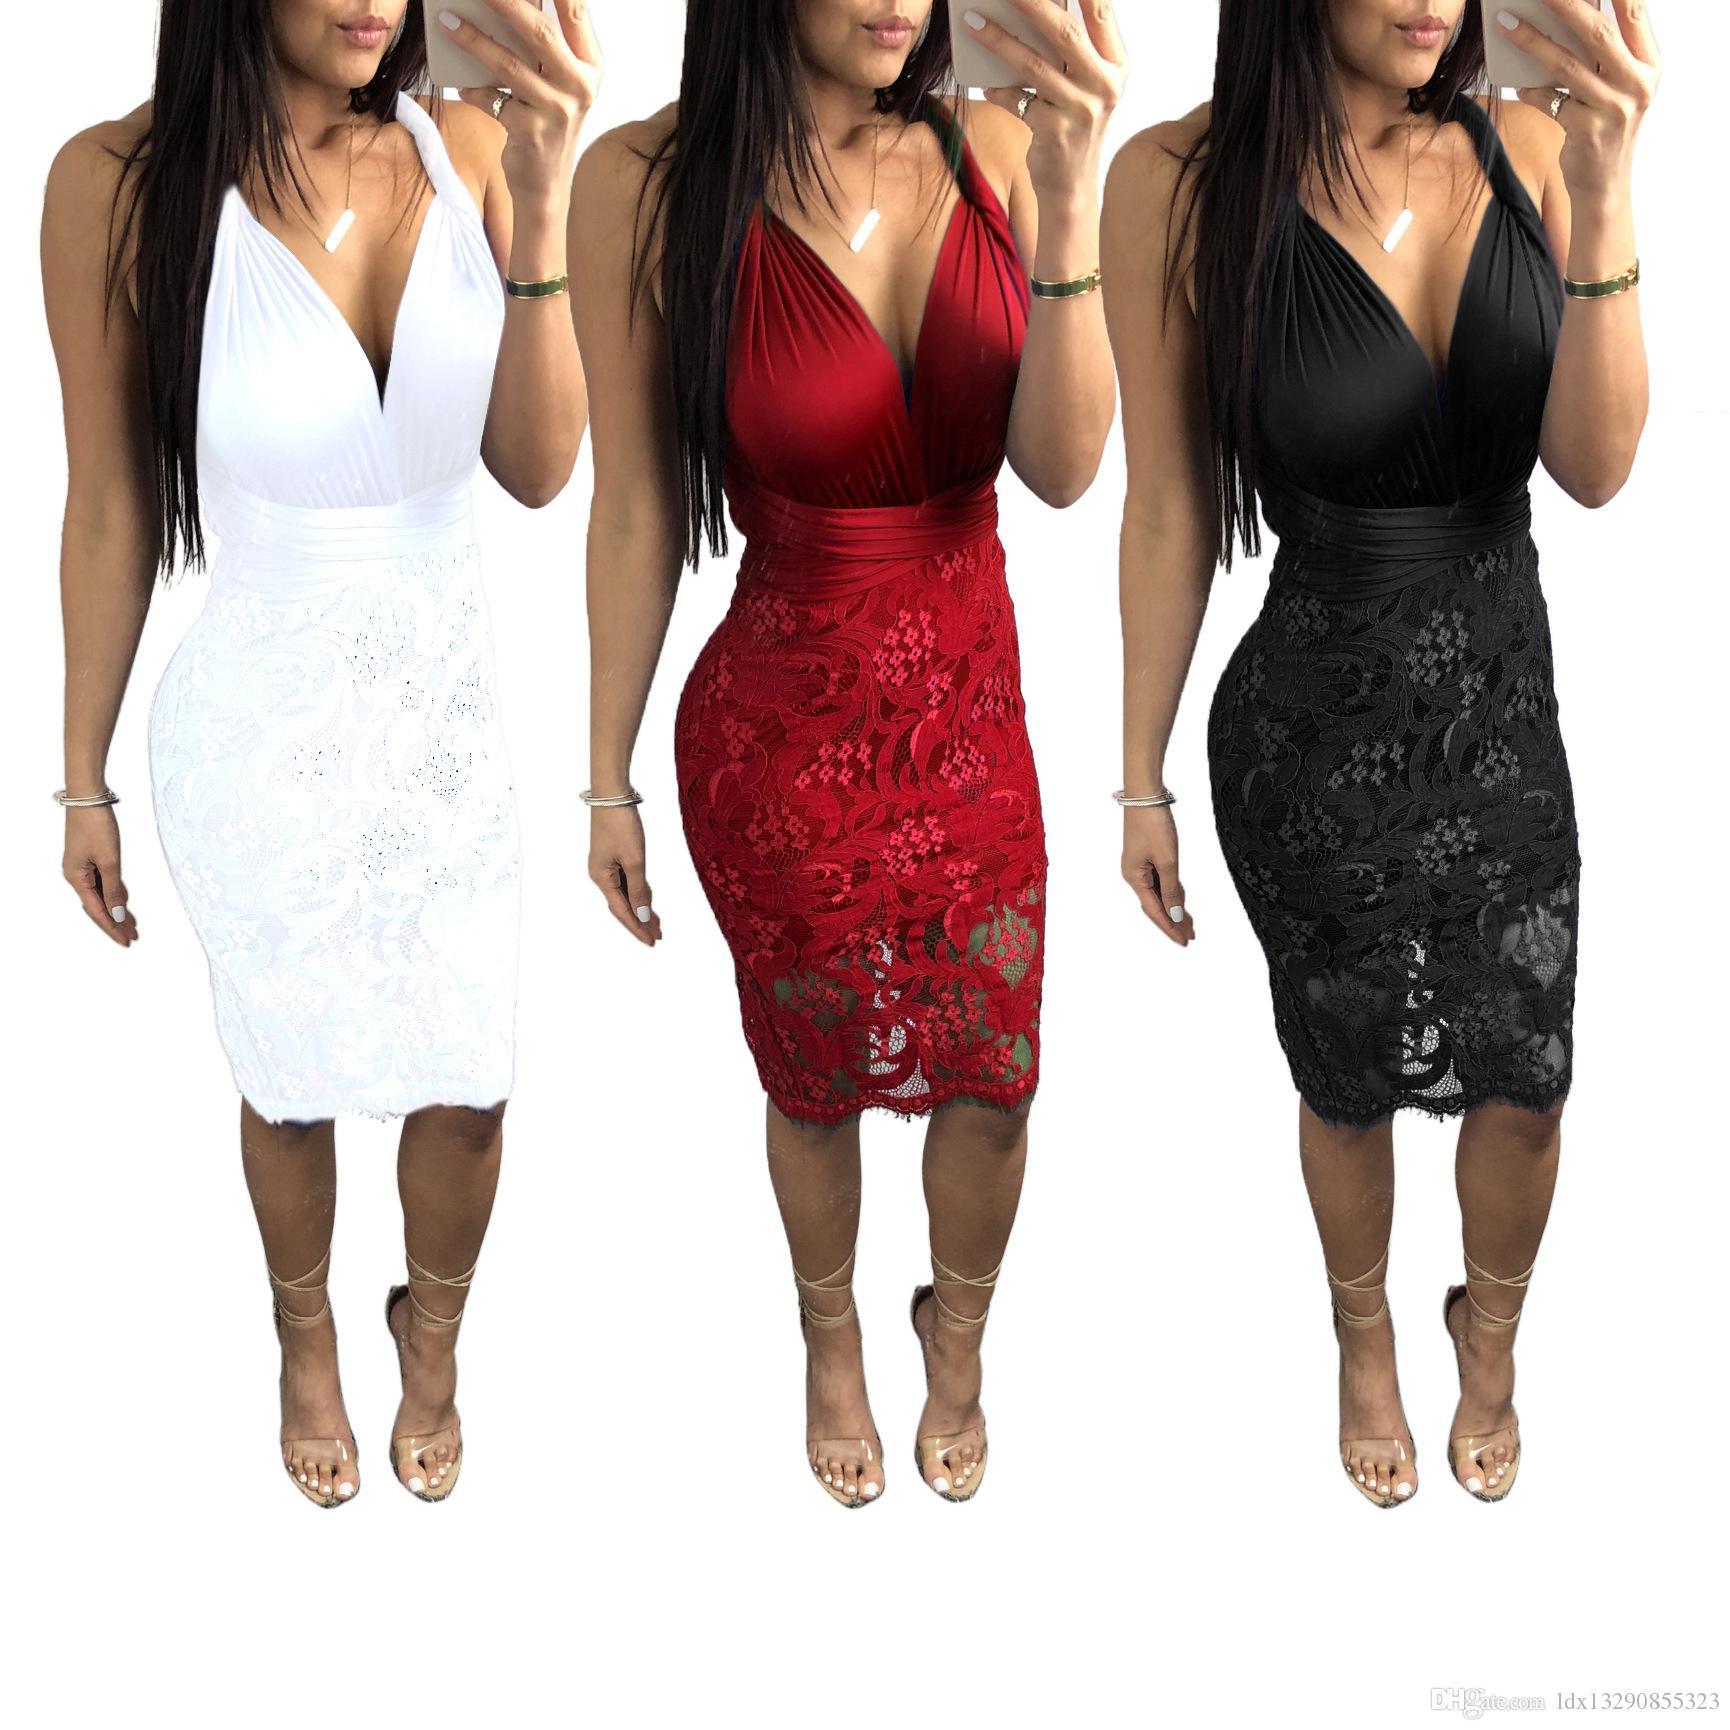 Multi-way Lace Midi Dress Women Back Cross Bodycon Bandage Dress Party Clubwear